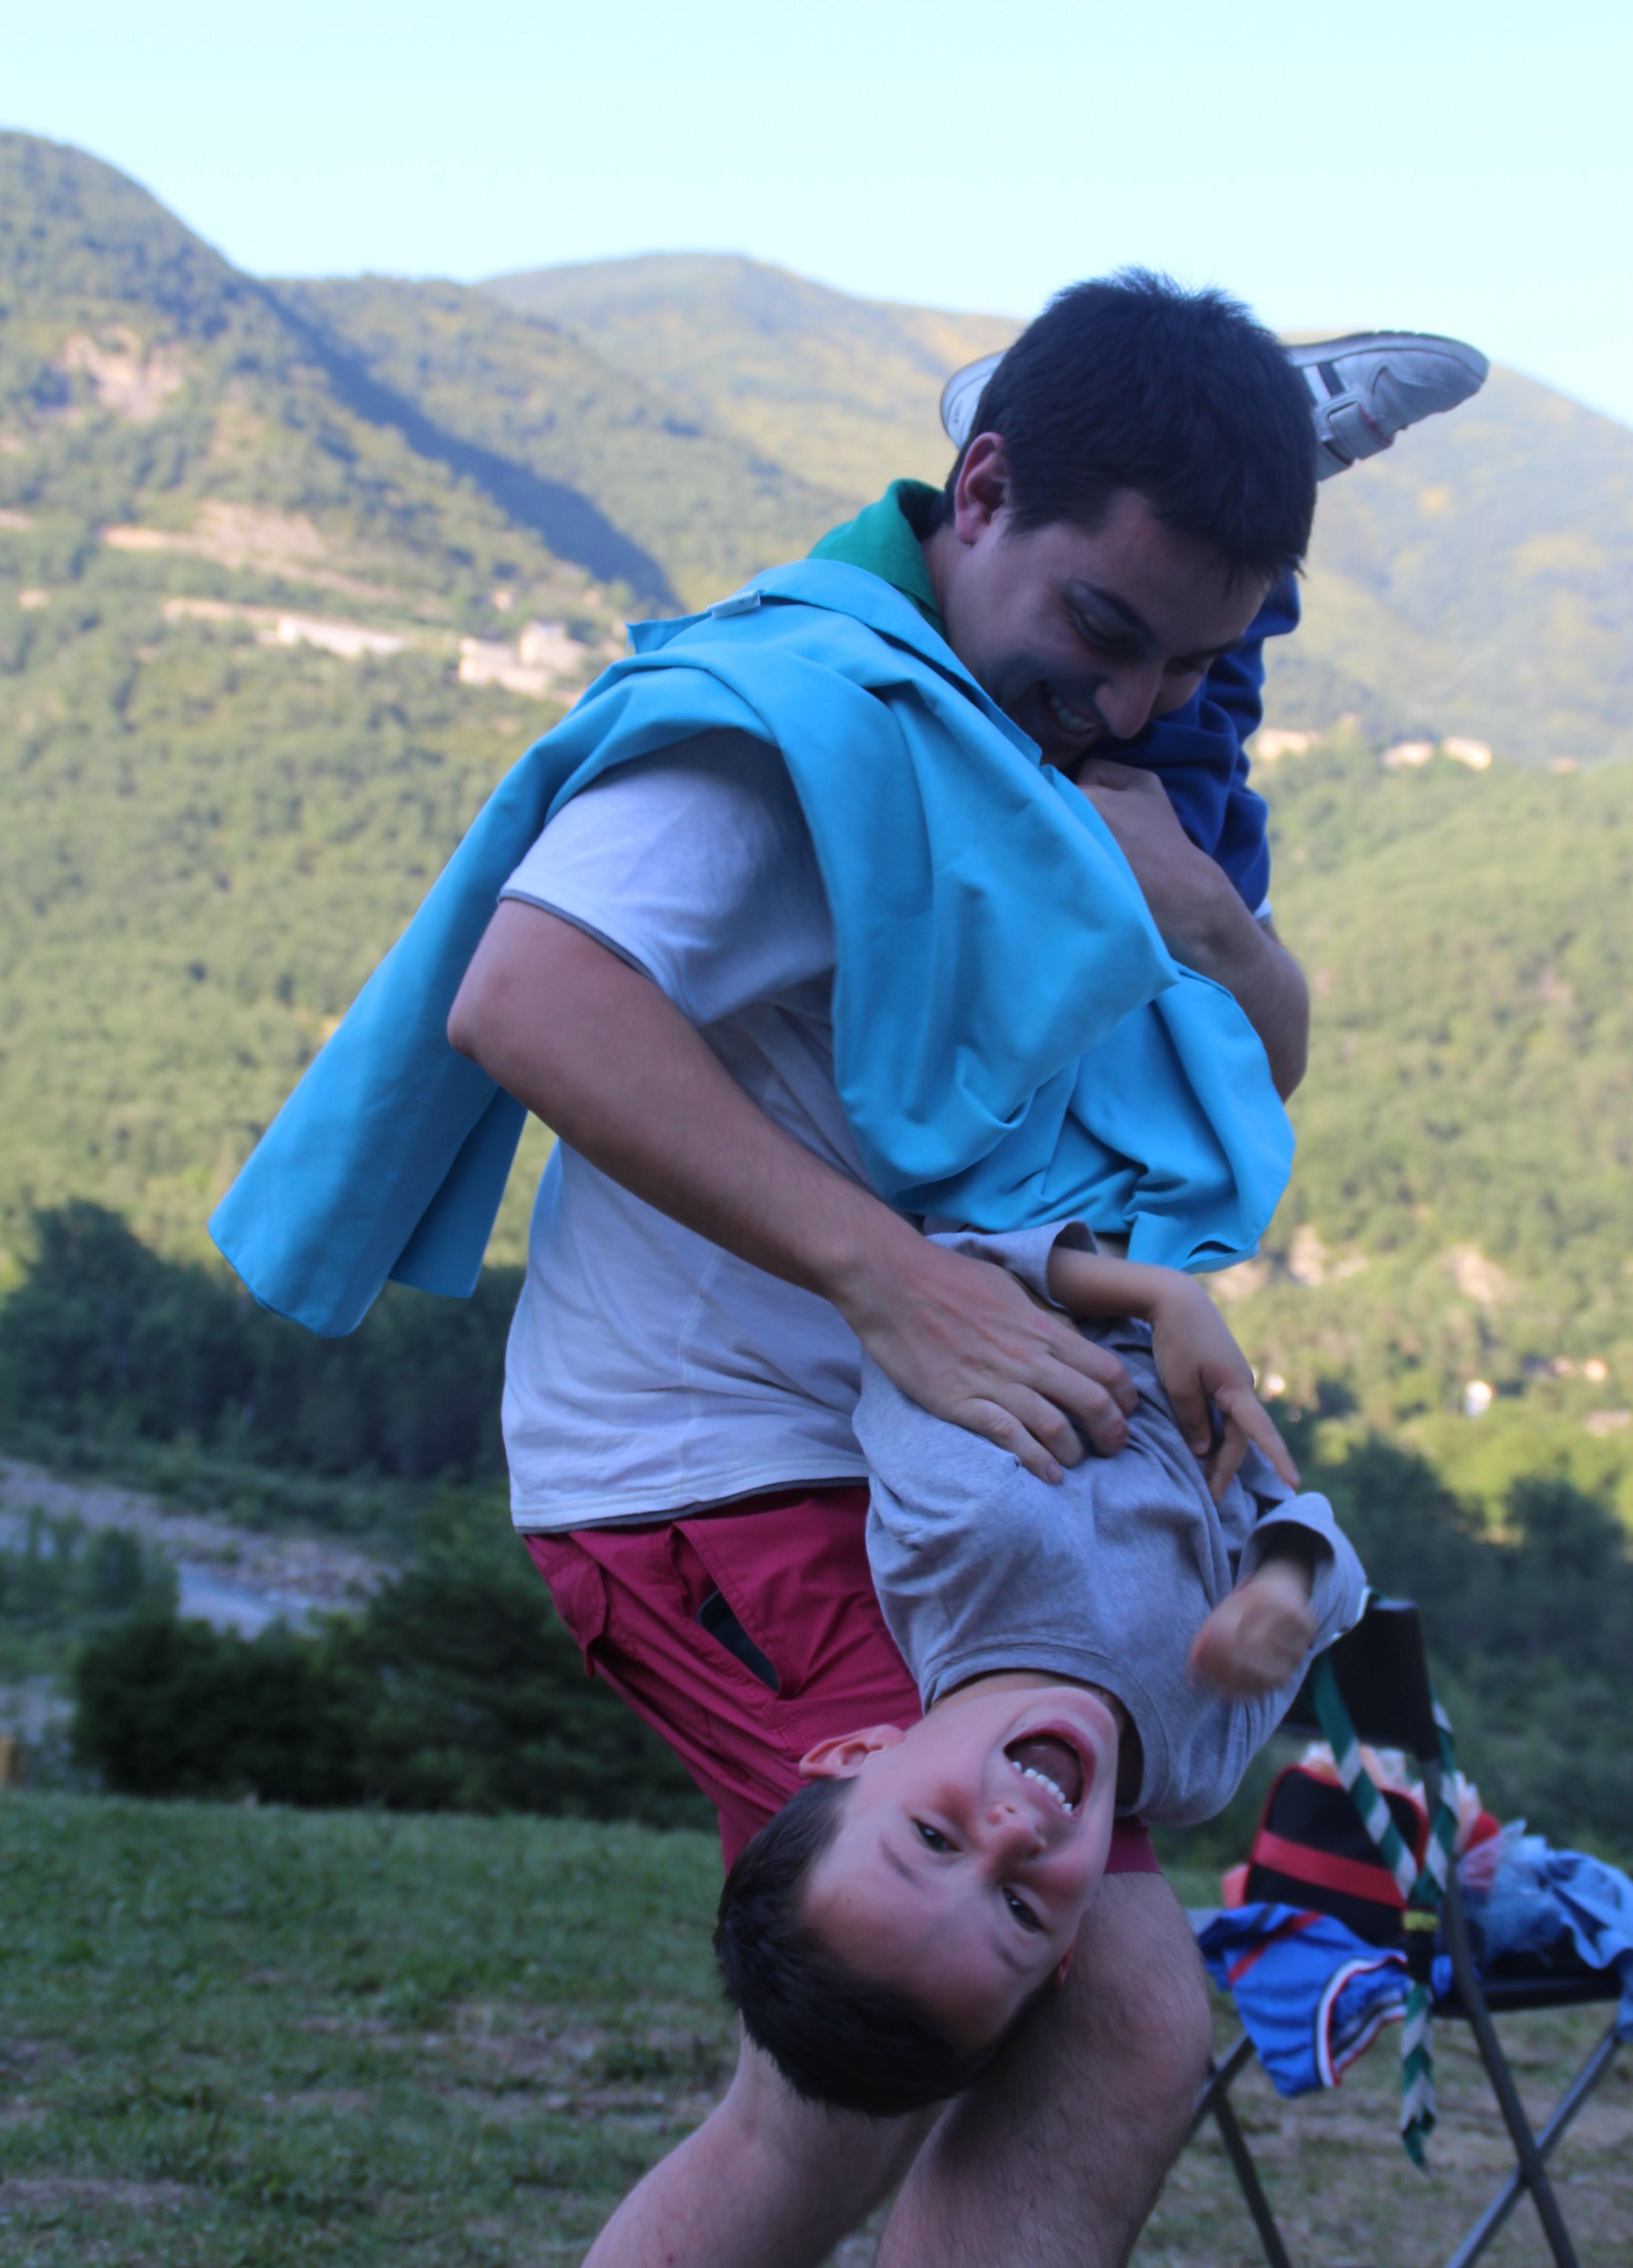 15-16 - Grupo - Campamento de verano - P83